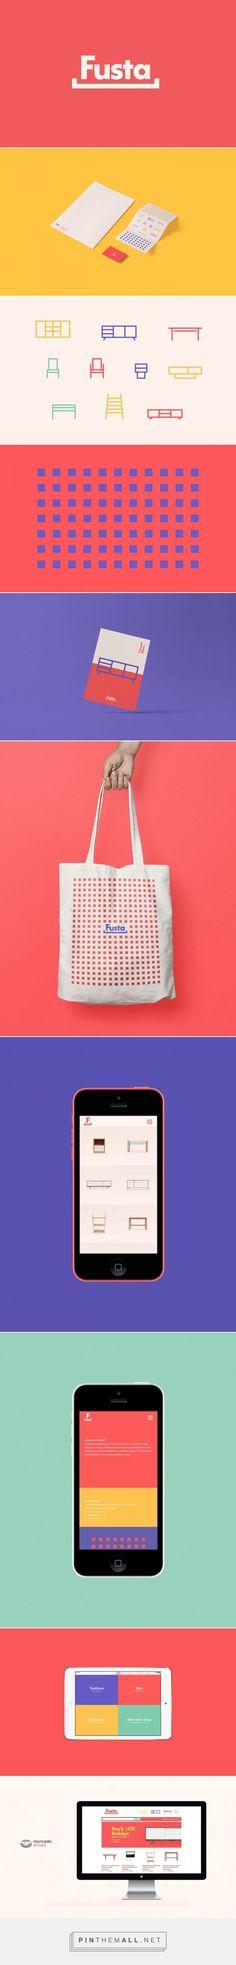 Fusta Branding on Behance   Fivestar Branding – Design and Branding Agency & Inspiration Gallery